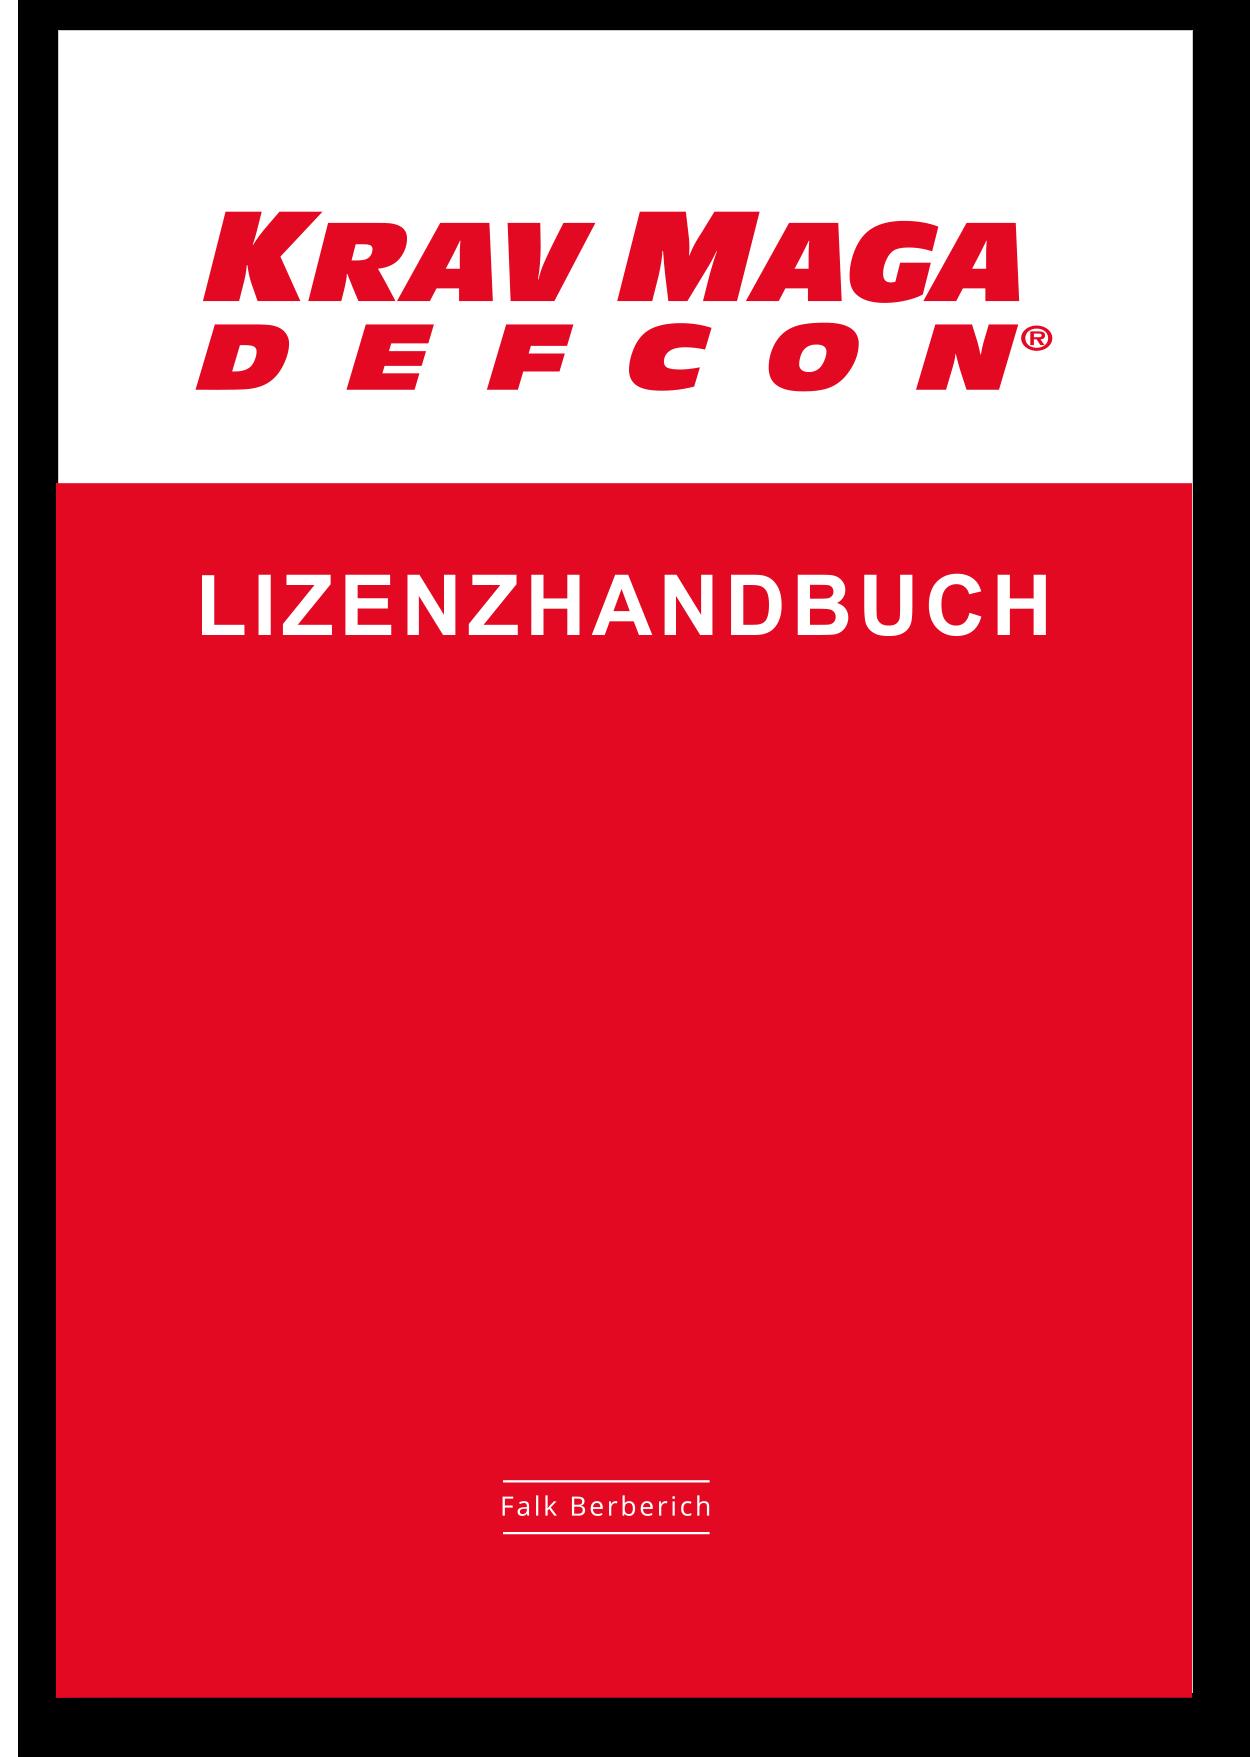 Krav Maga DEFCON® Lizenzhandbuch